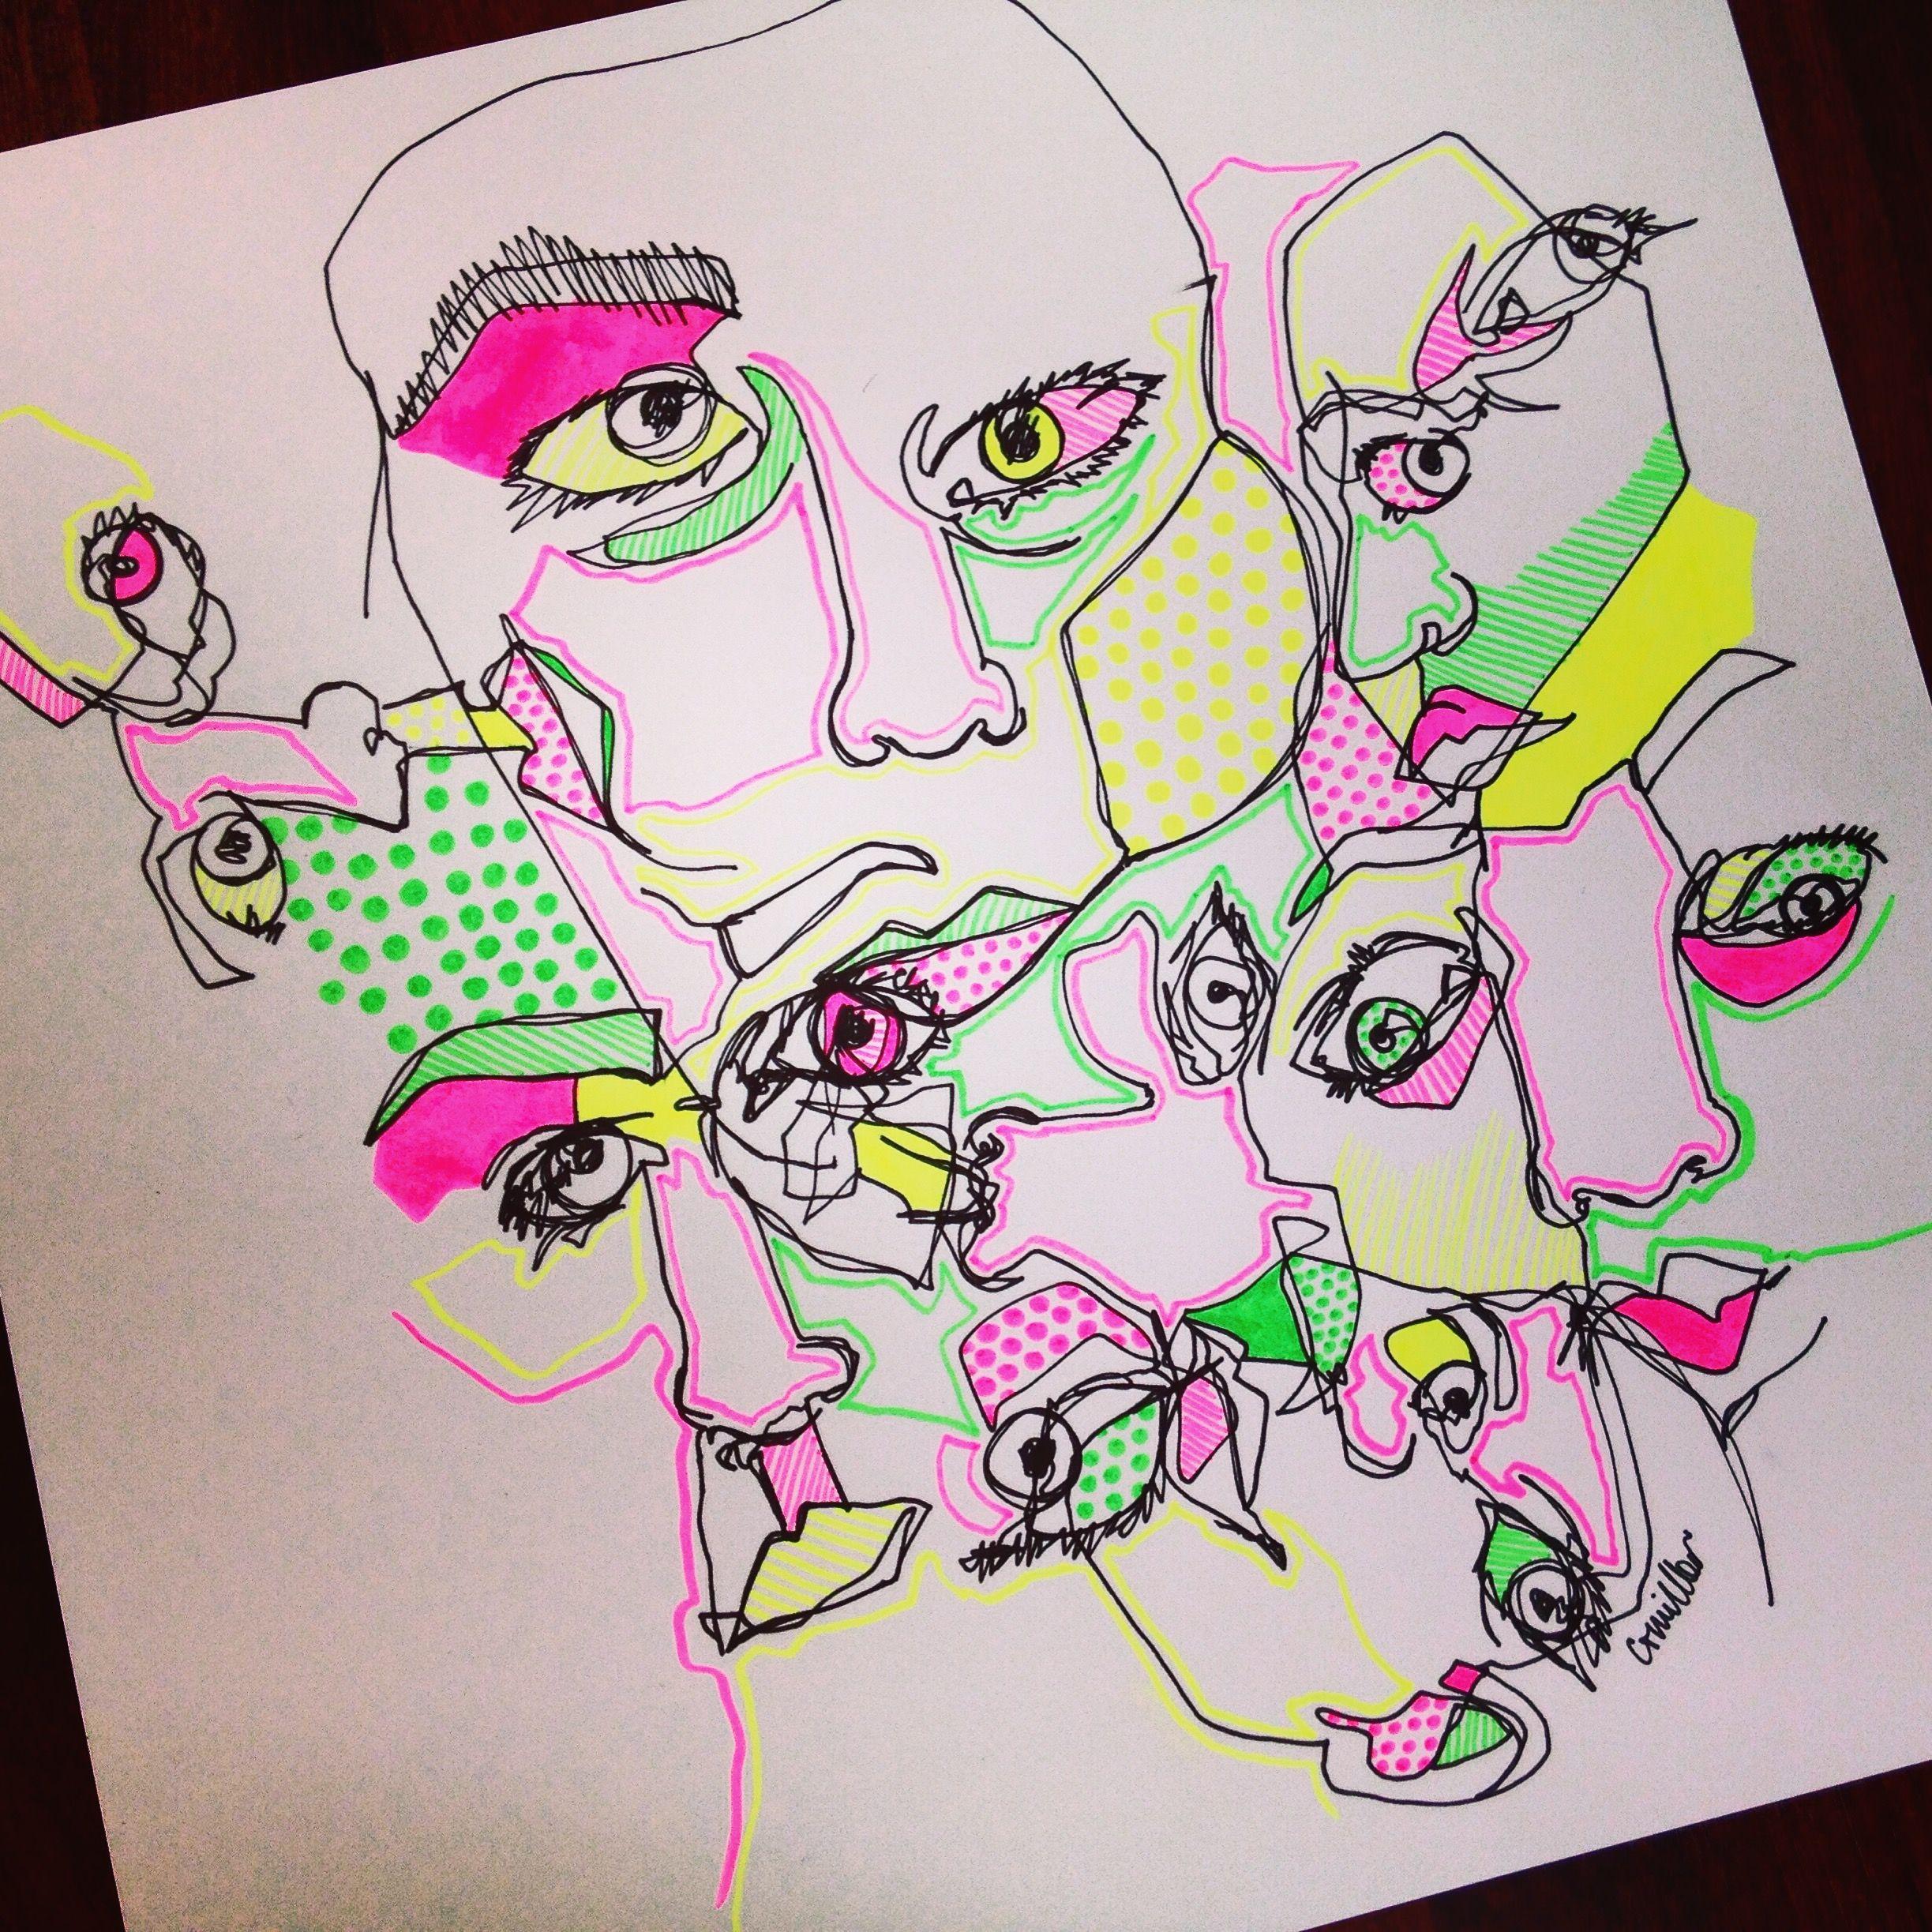 Self Portrait Blind Contour Drawings In Black Ink